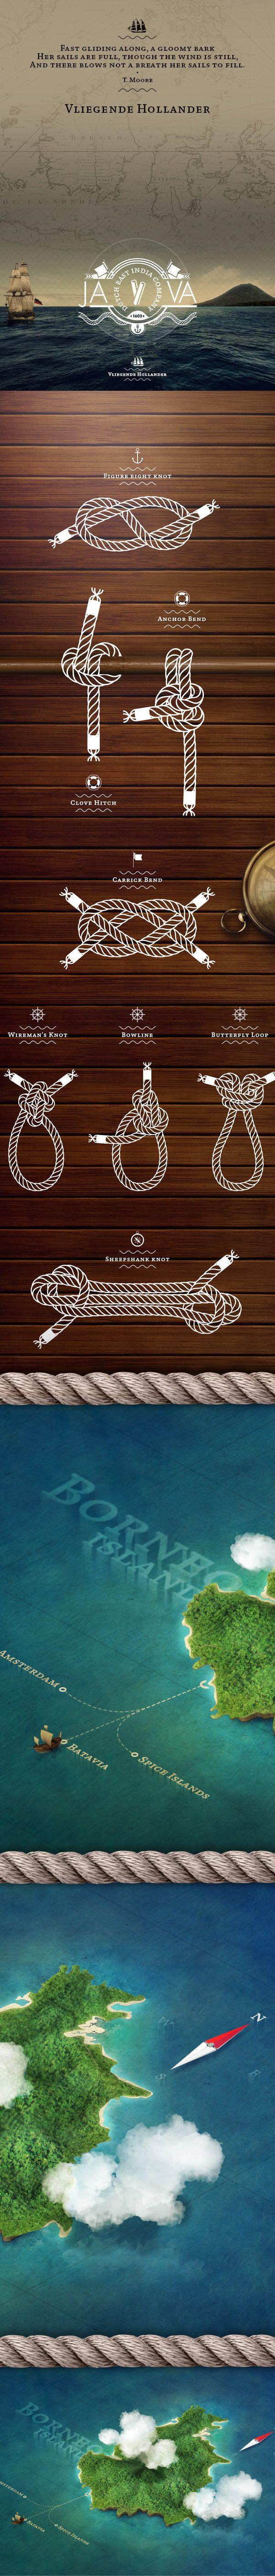 Vliegende Hollander by Alessandro Suraci, via Behance. | #webdesign #it #web…